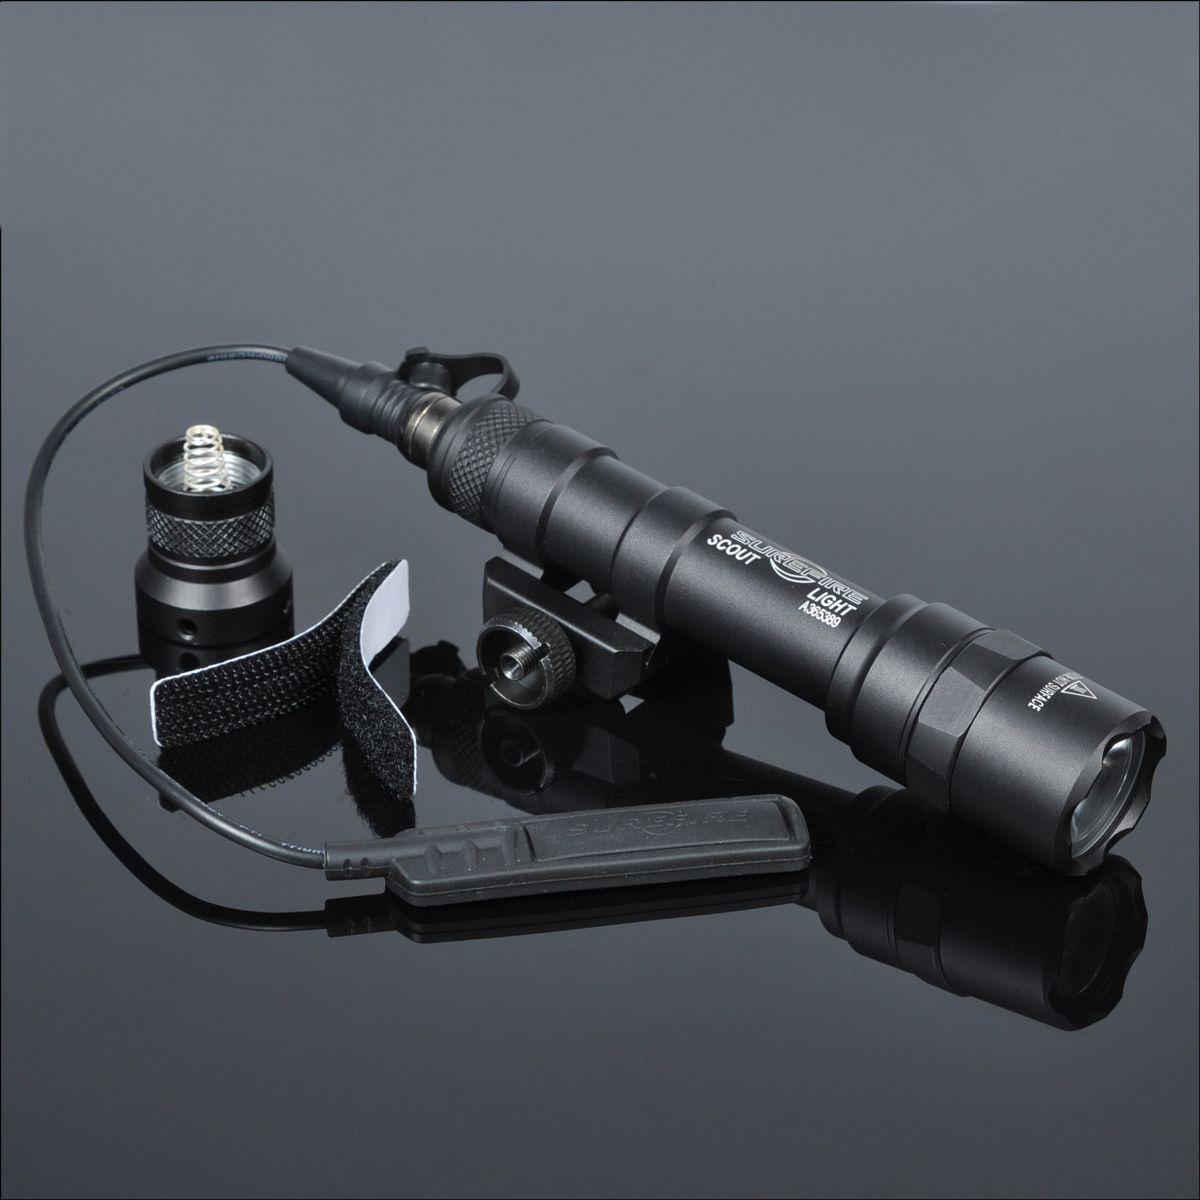 400 Lumens Tactical SF M600B Scout Light Lanterna Airsoft Flashlight Hunting Keymod Picatinny Rail Mount Gun Light